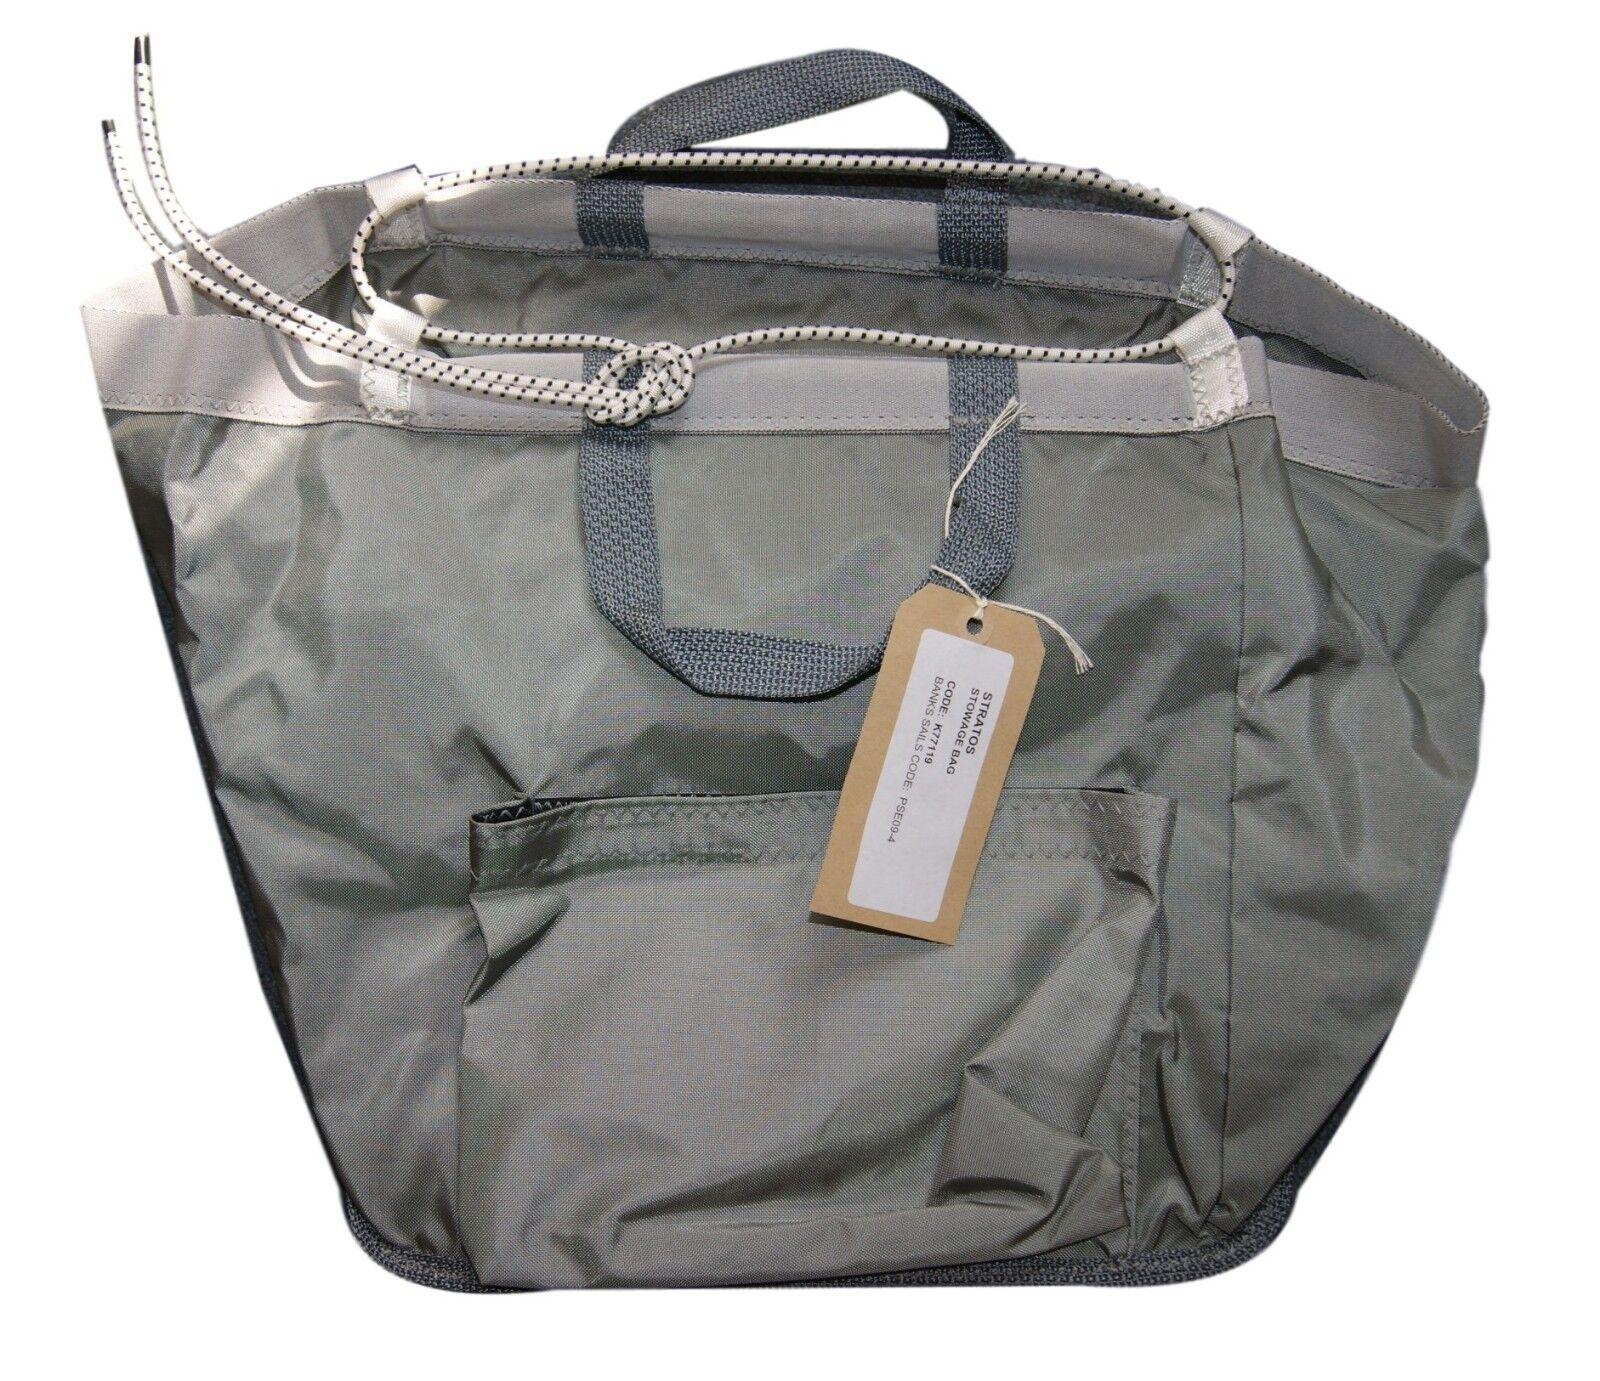 Replacement Laser Stratos Stowage Bag   HT7097